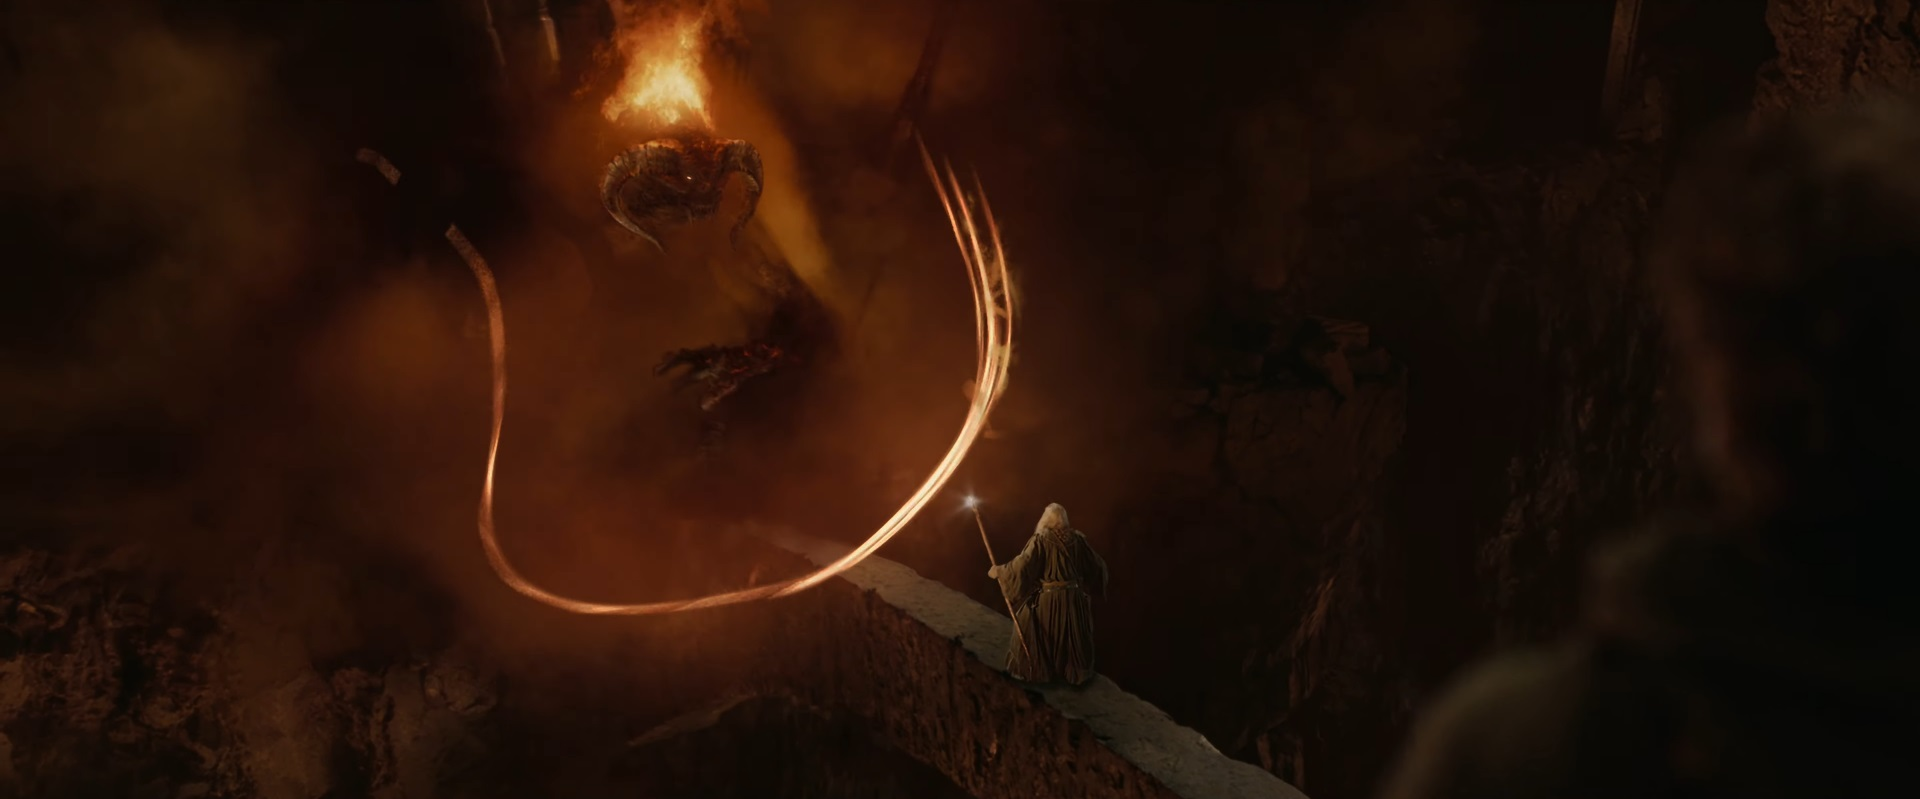 Gandalf_confronts_balrog.jpg